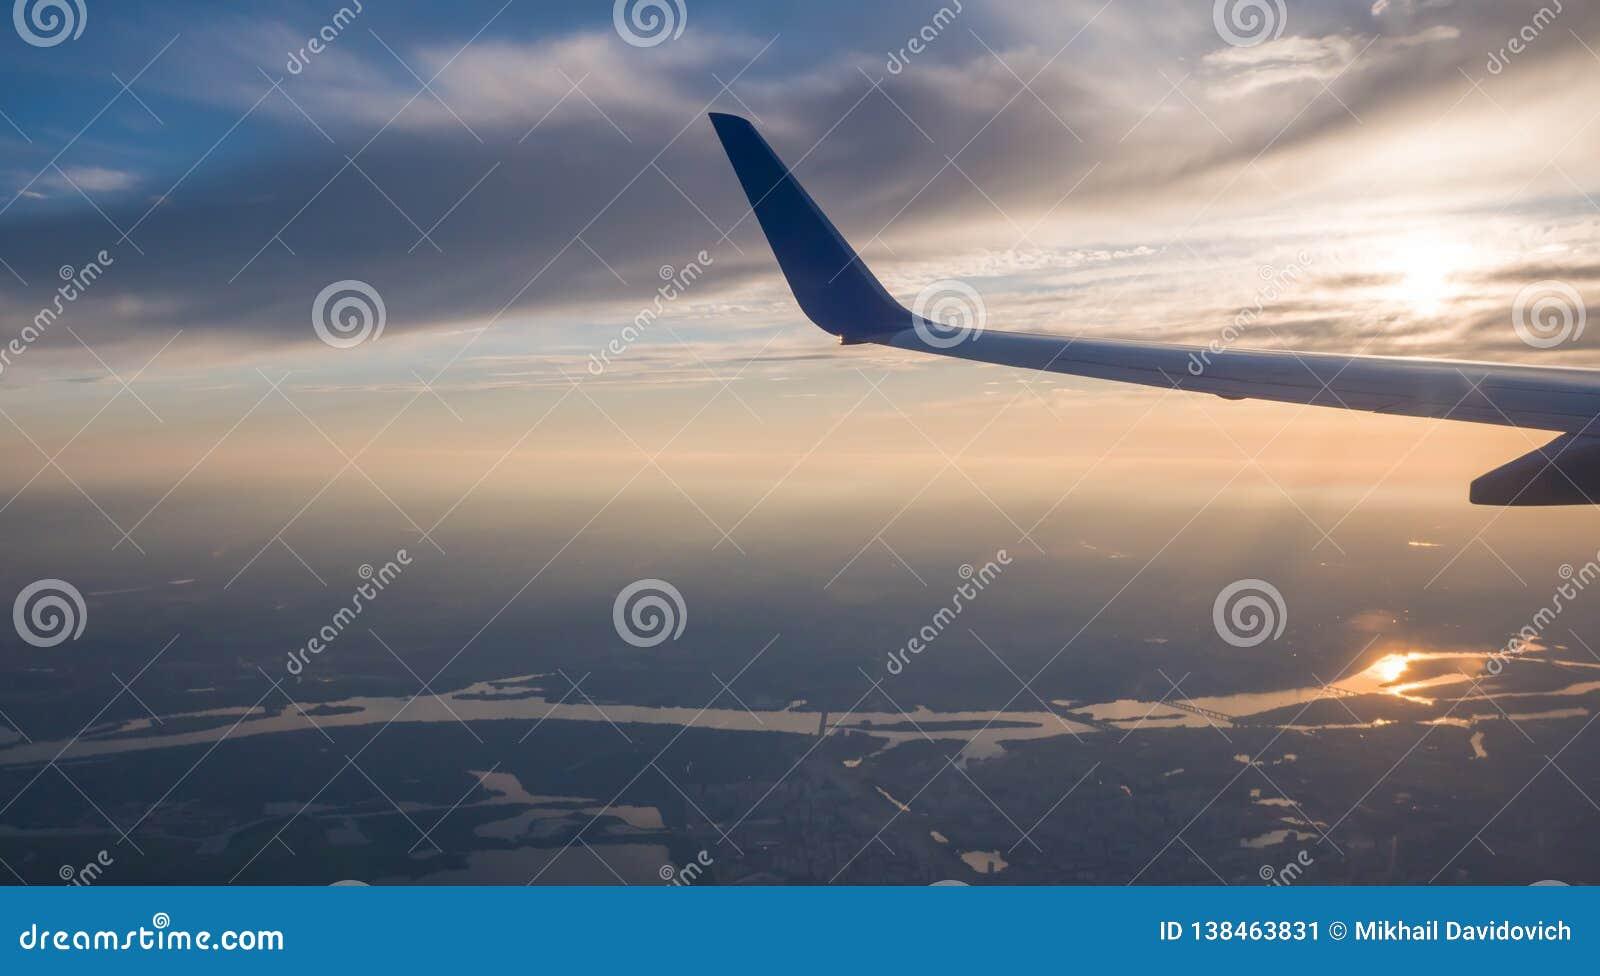 Небо захода солнца на самолете, плоском окне, над Киевом Украина